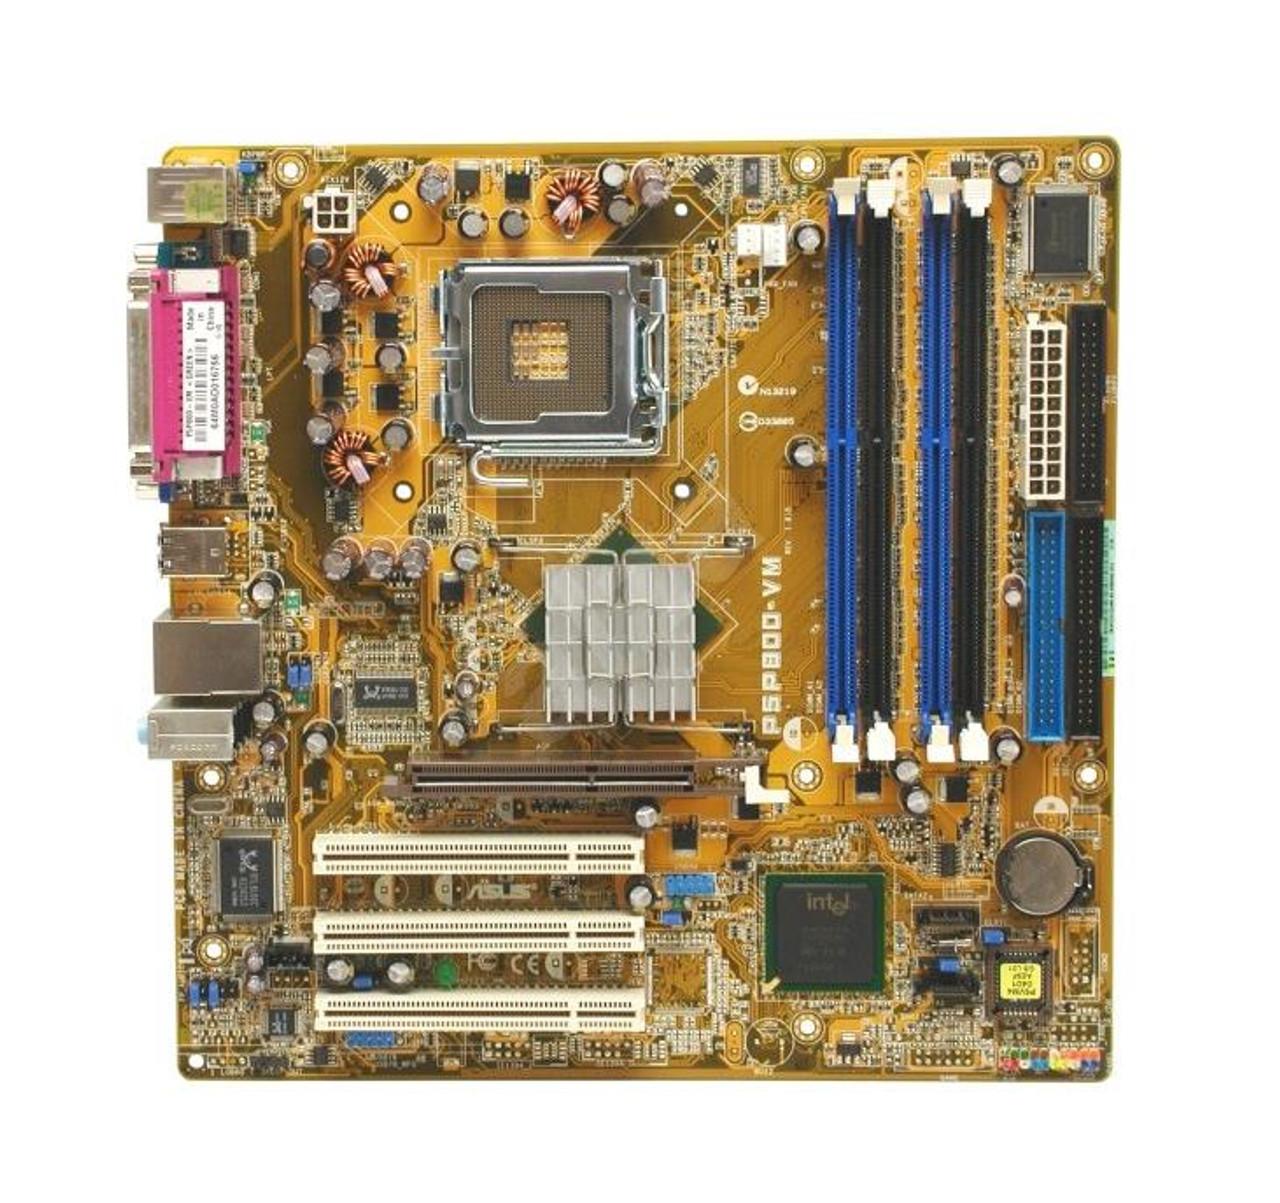 Drivers Asus A55BM-A/USB3 AMD Chipset/Graphics